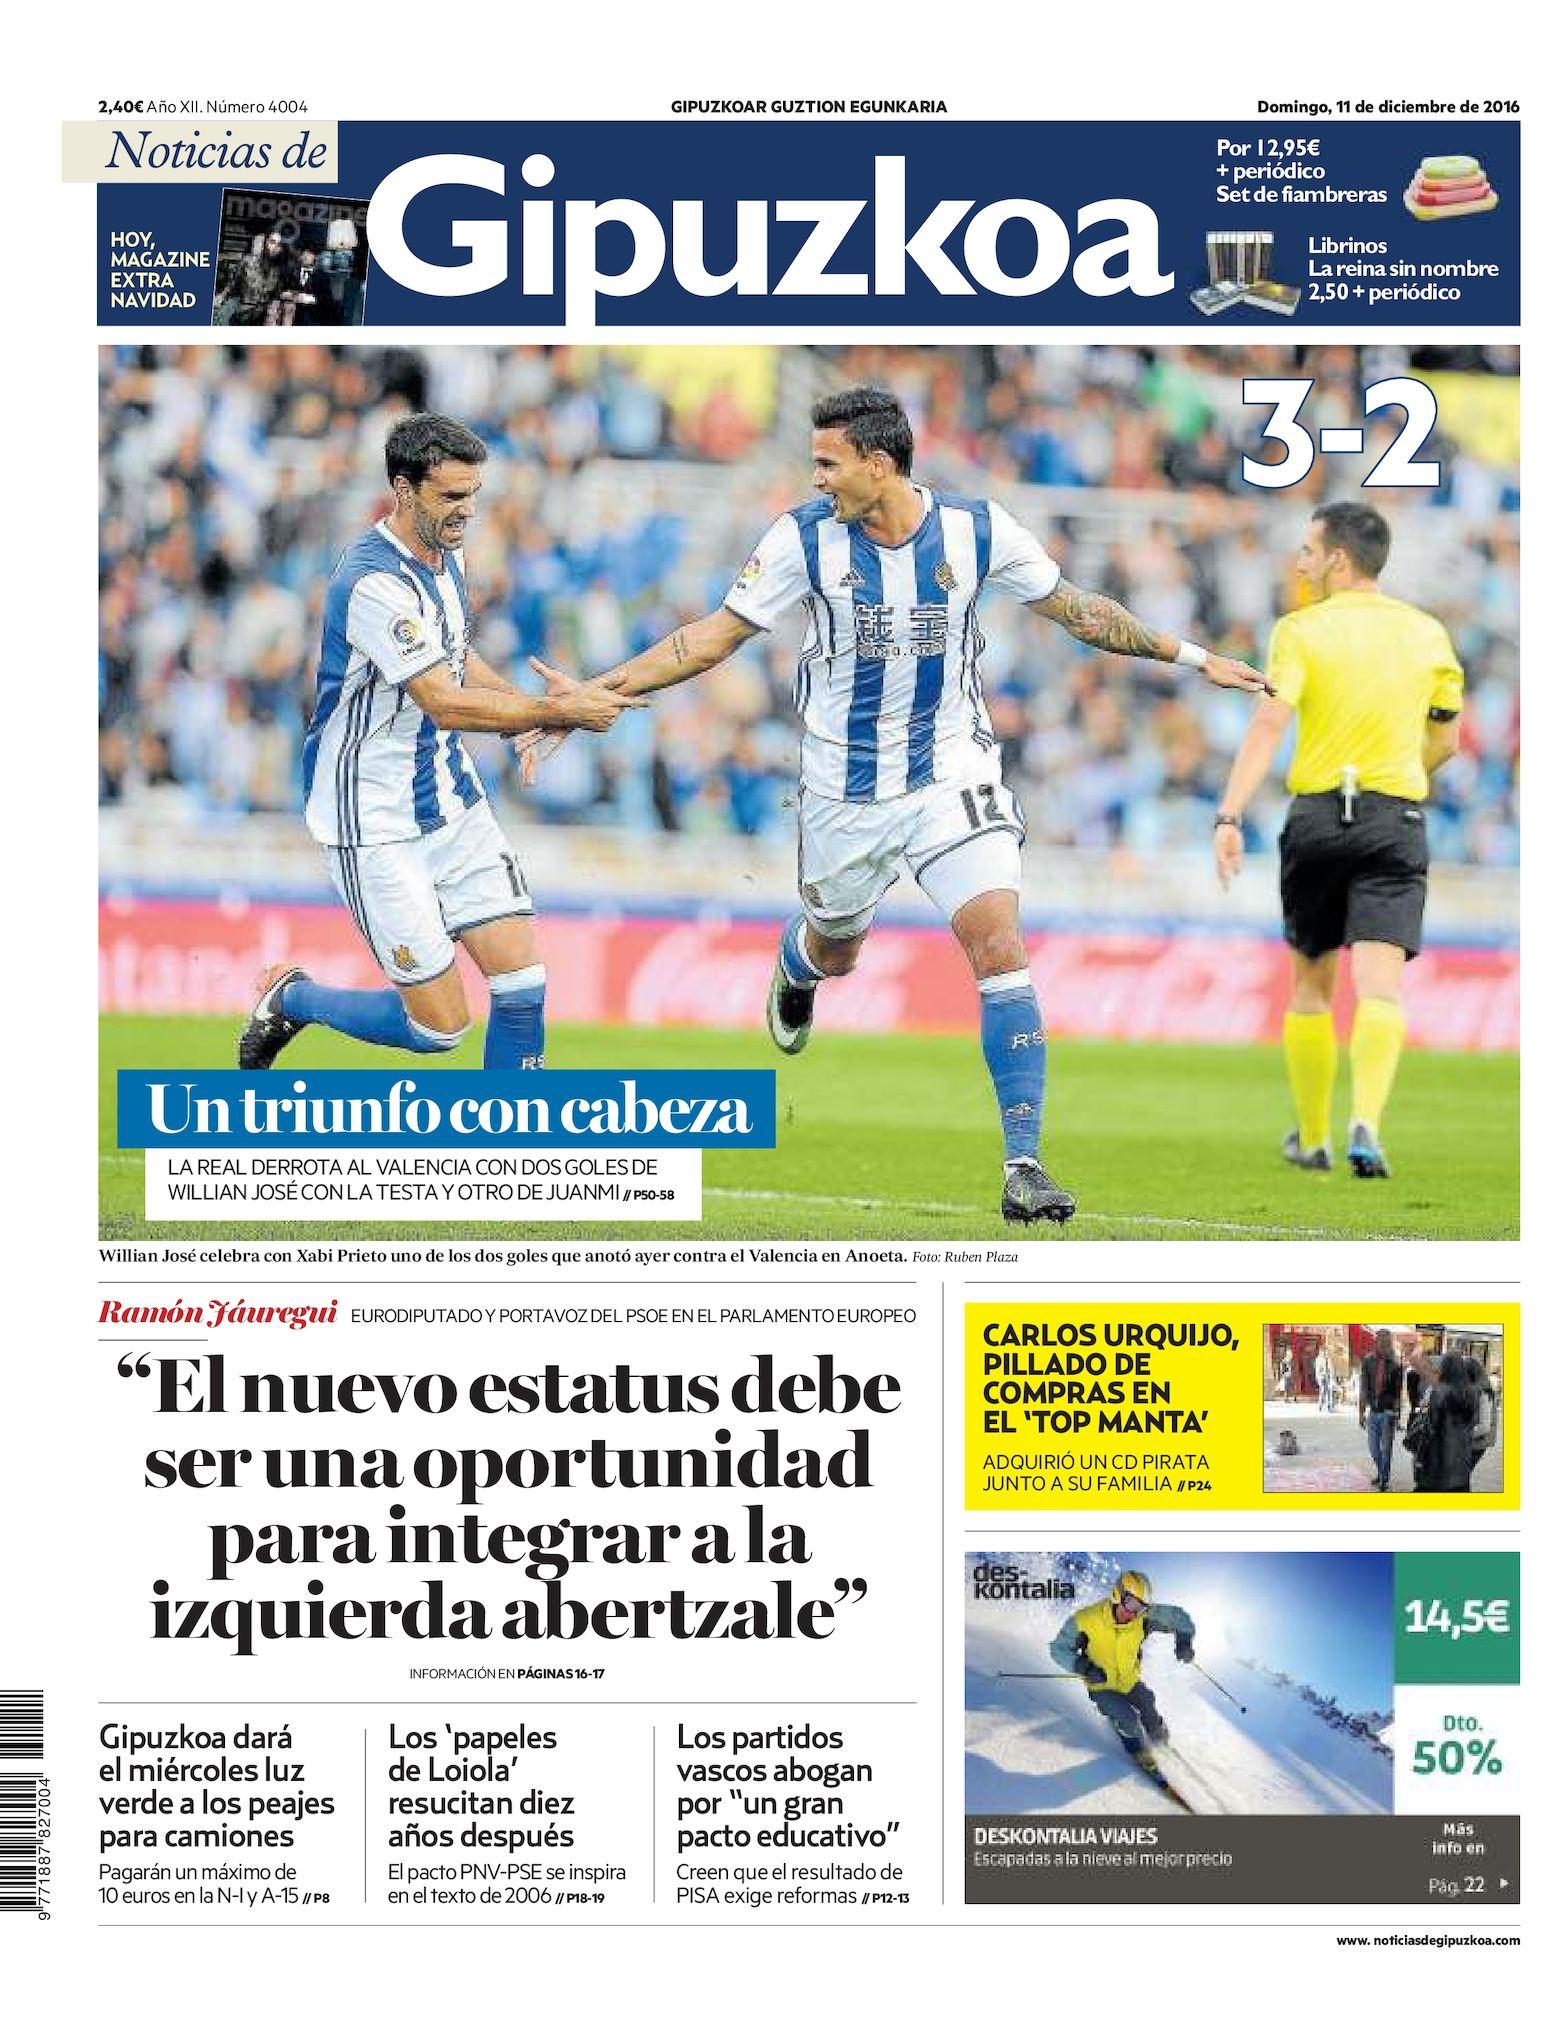 Soccer Legends Moneda Conmemorativa Iniesta